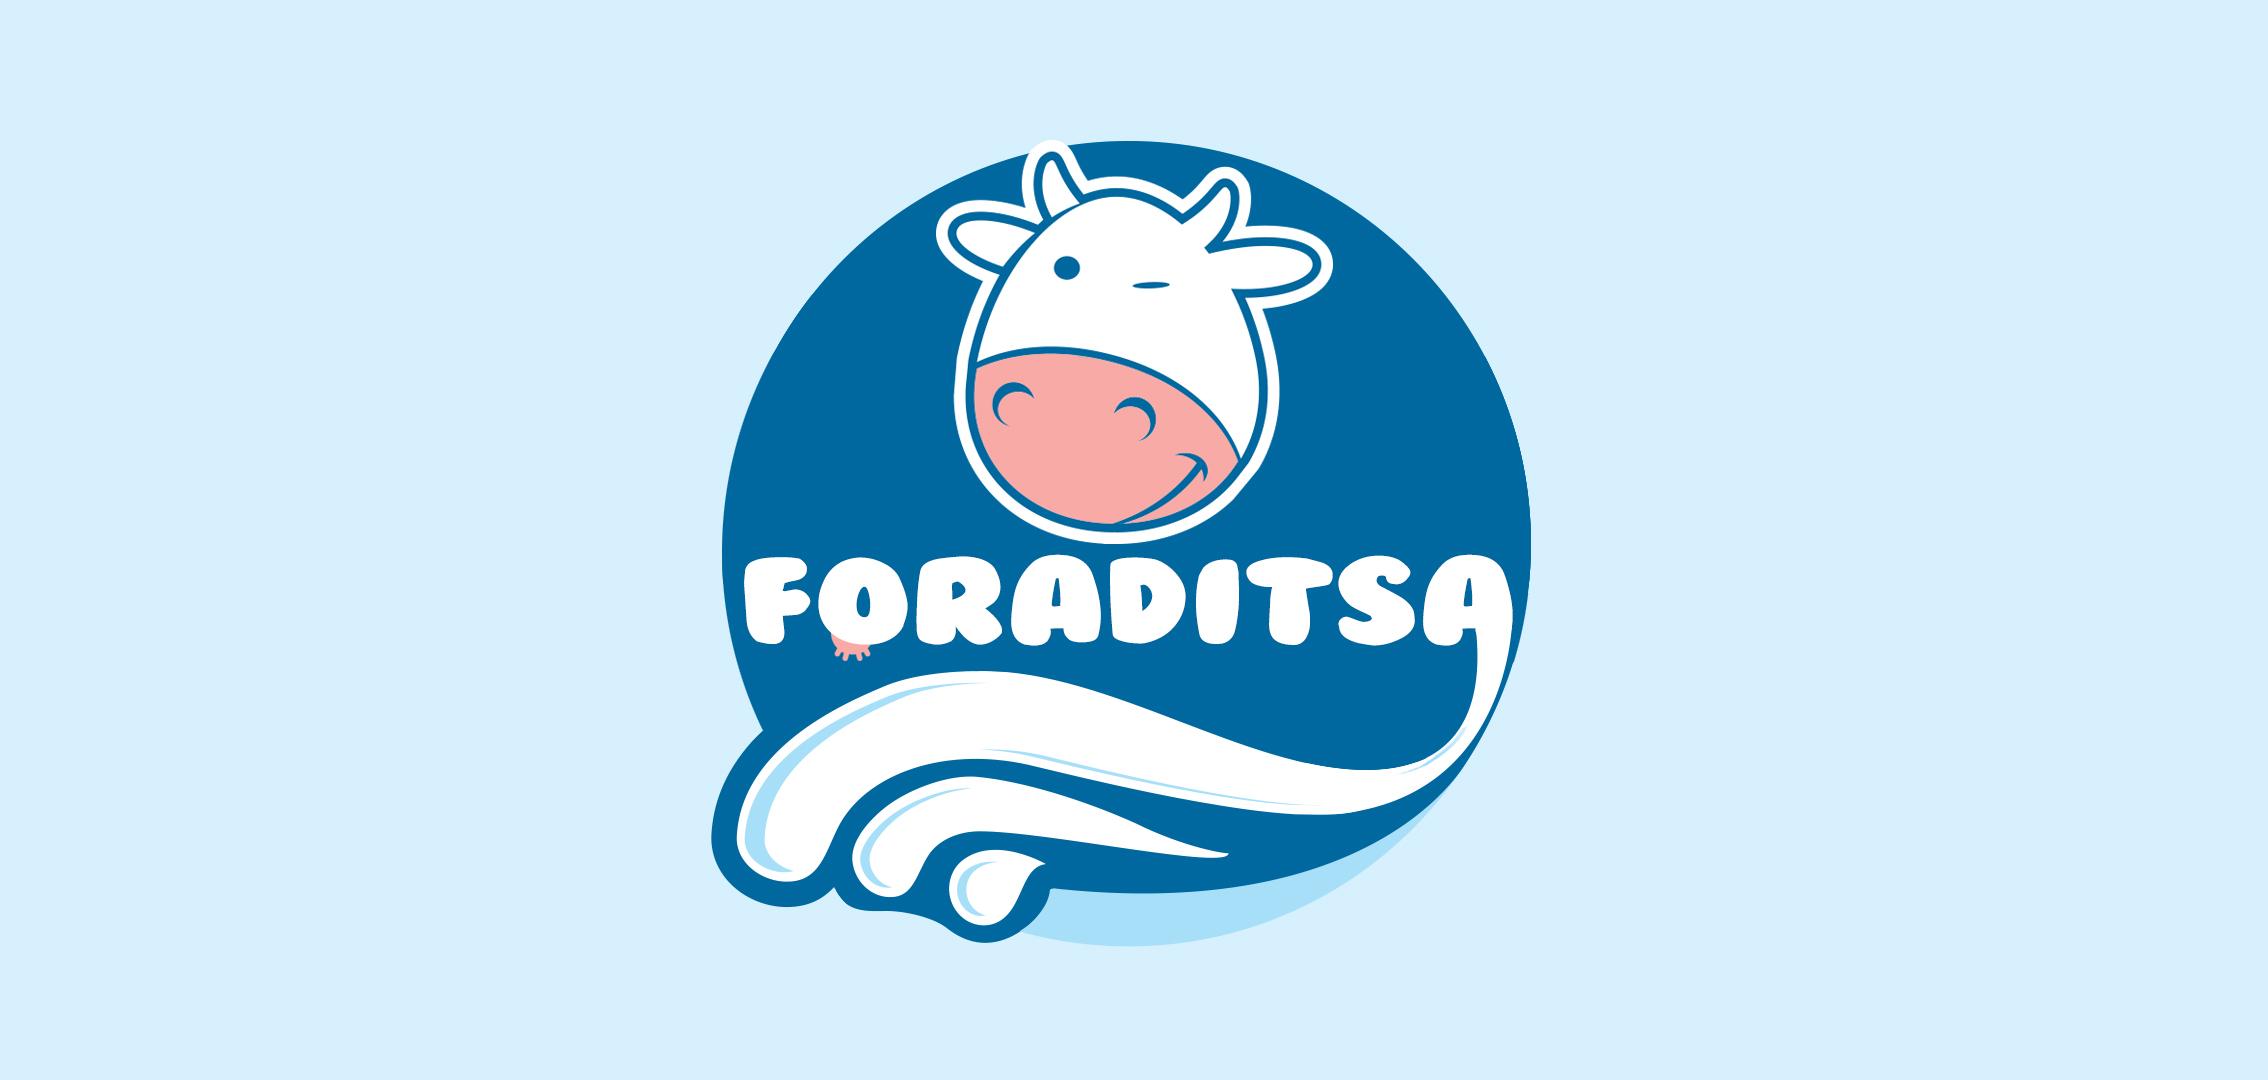 Foraditsa logo